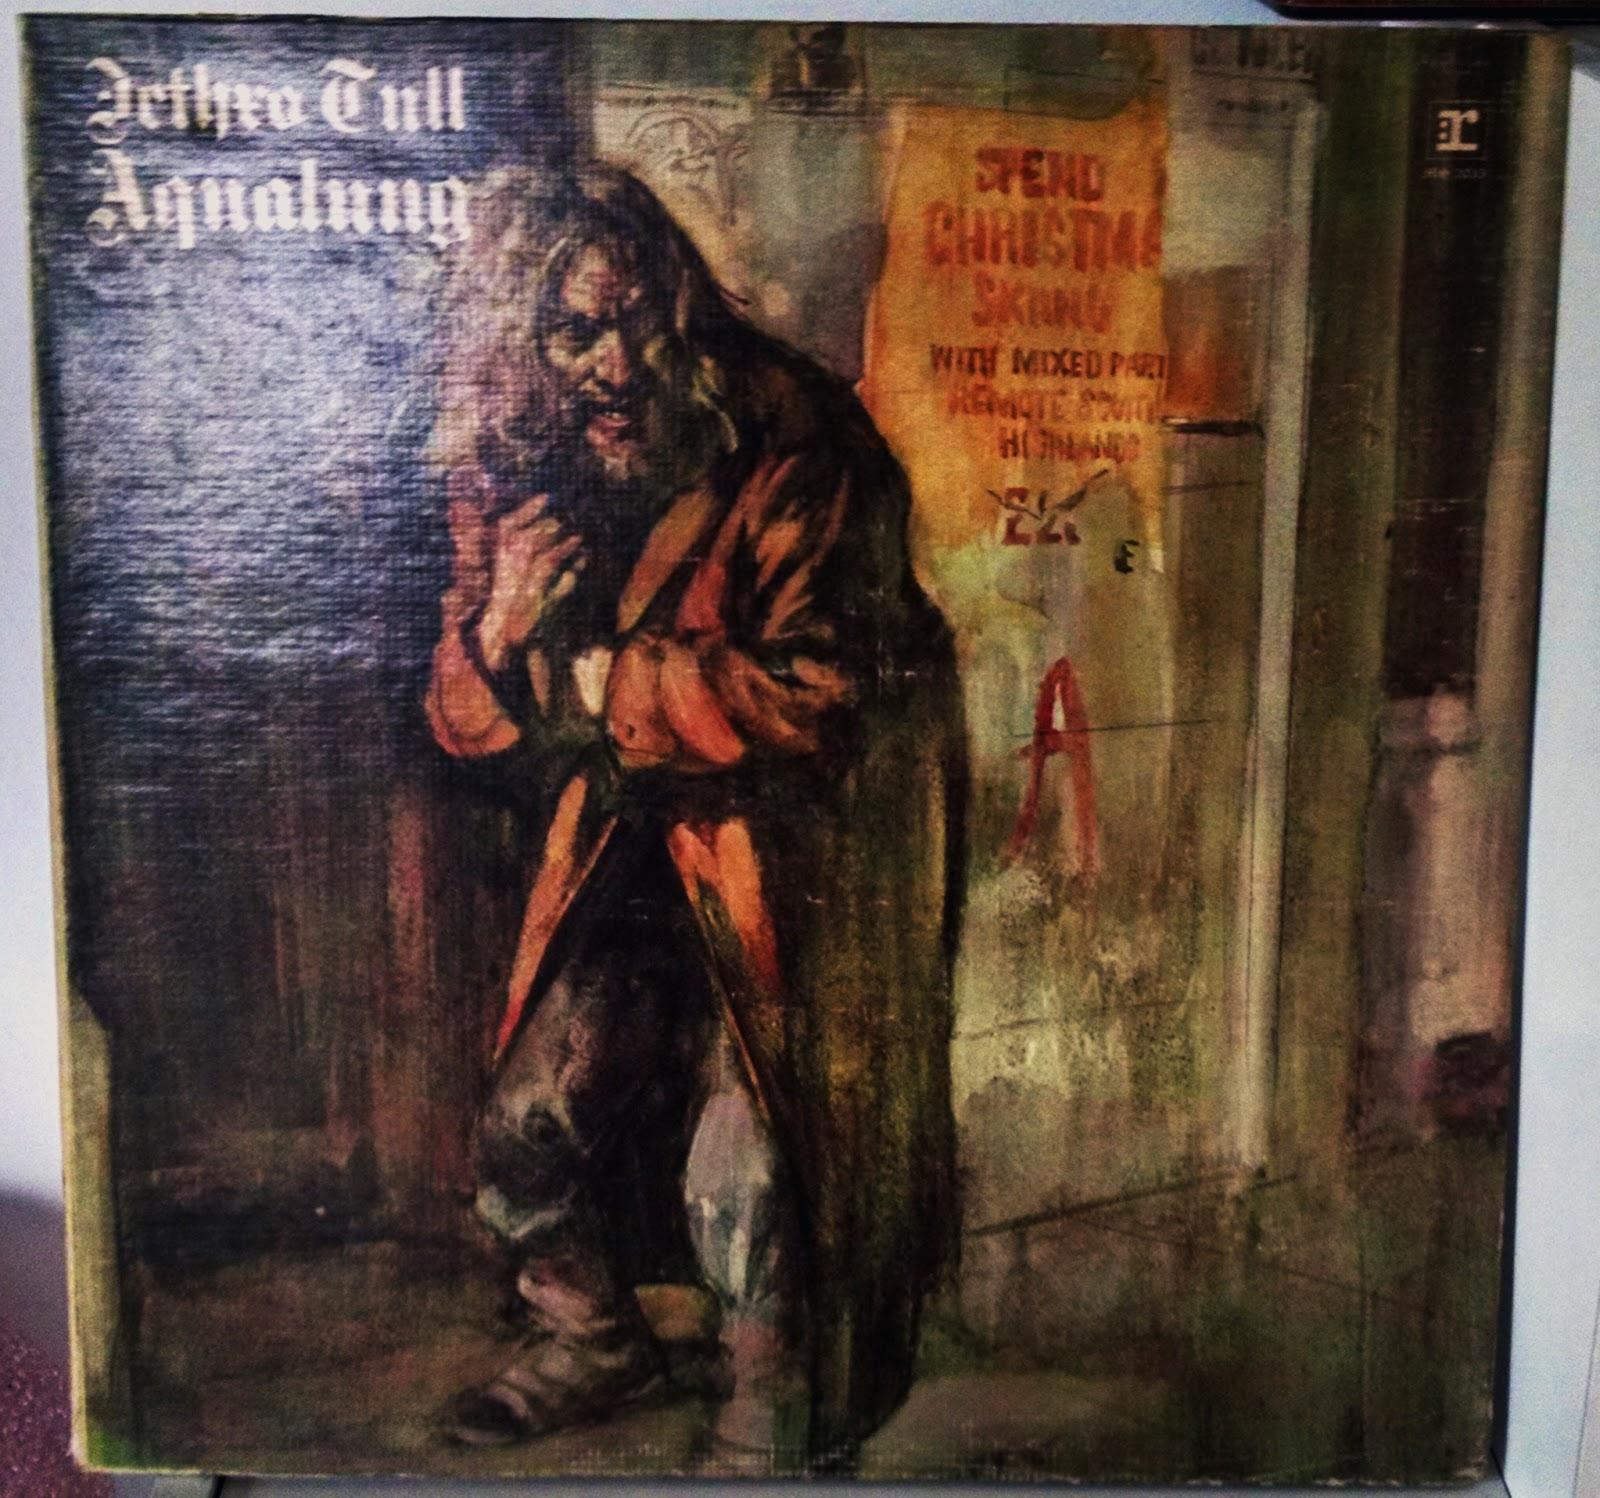 Life At 33 1 3 Aqualung 1971 Jethro Tull Rerpise